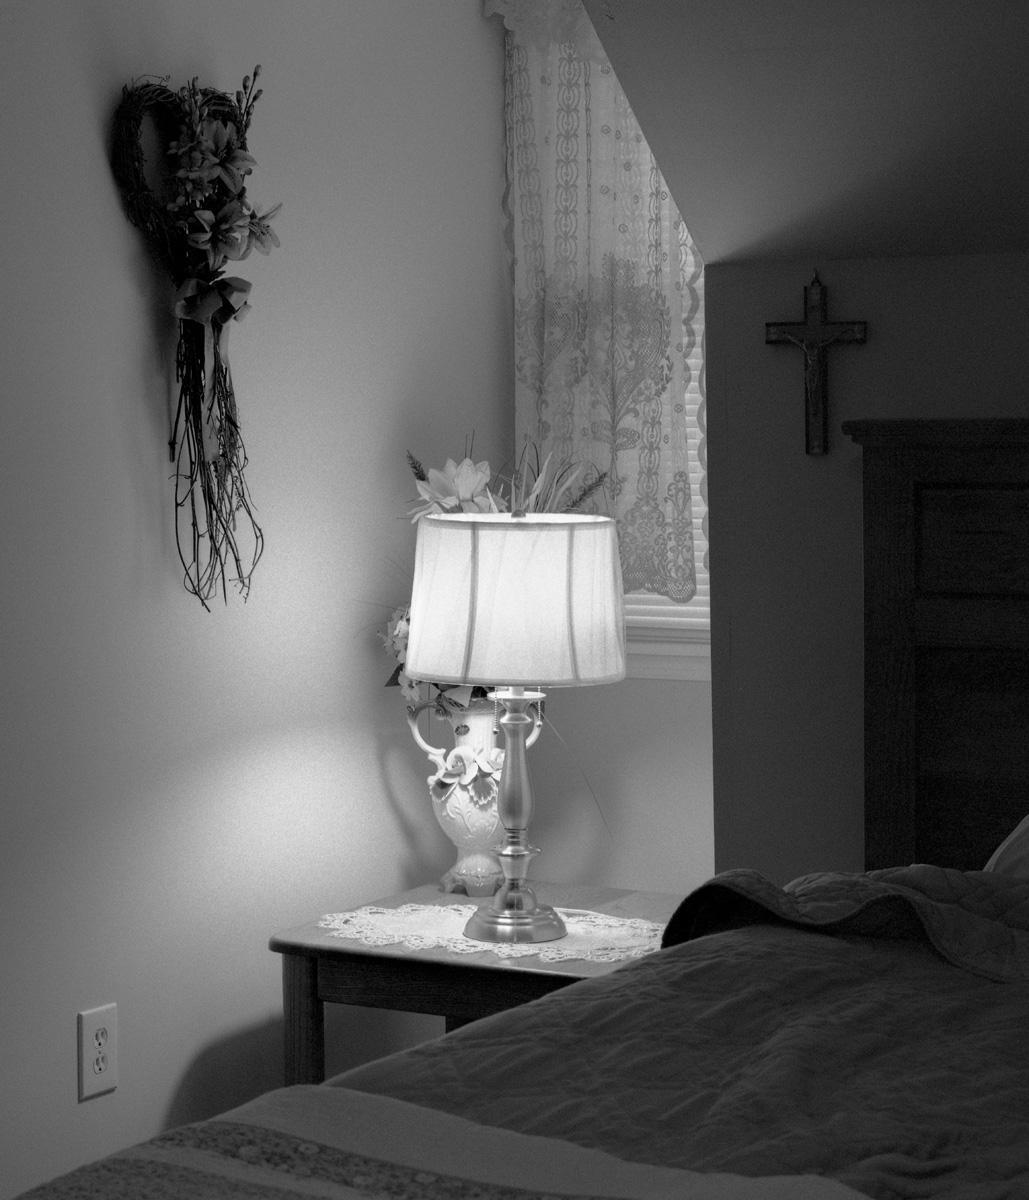 Josh Chaney Nuclear Family C41magazine Photography 6